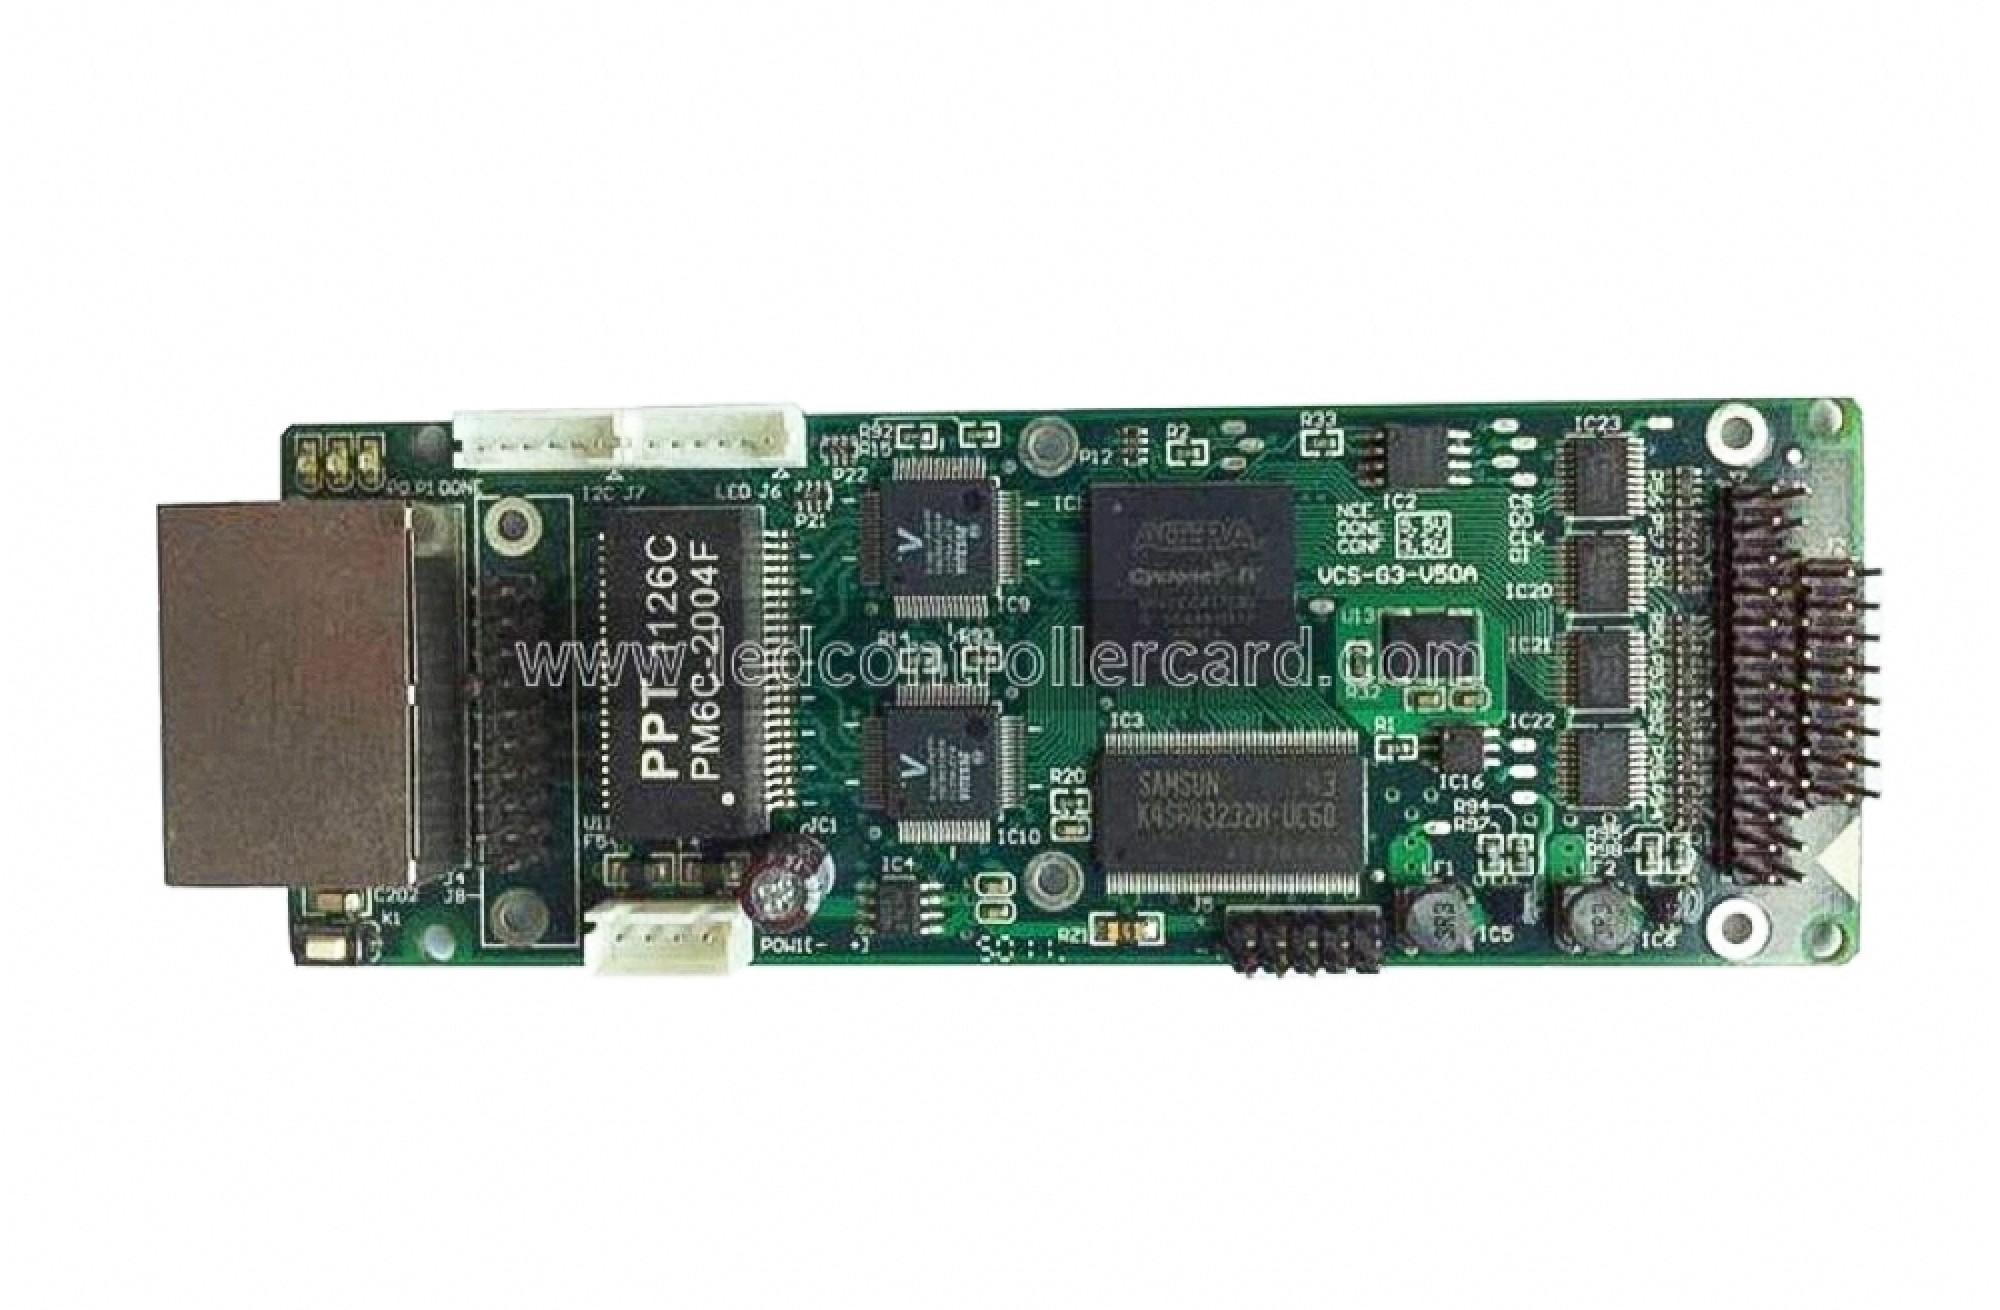 Mooncell VCSG3-V50A-XYS02 LED Asynchronous Data Receiving Card